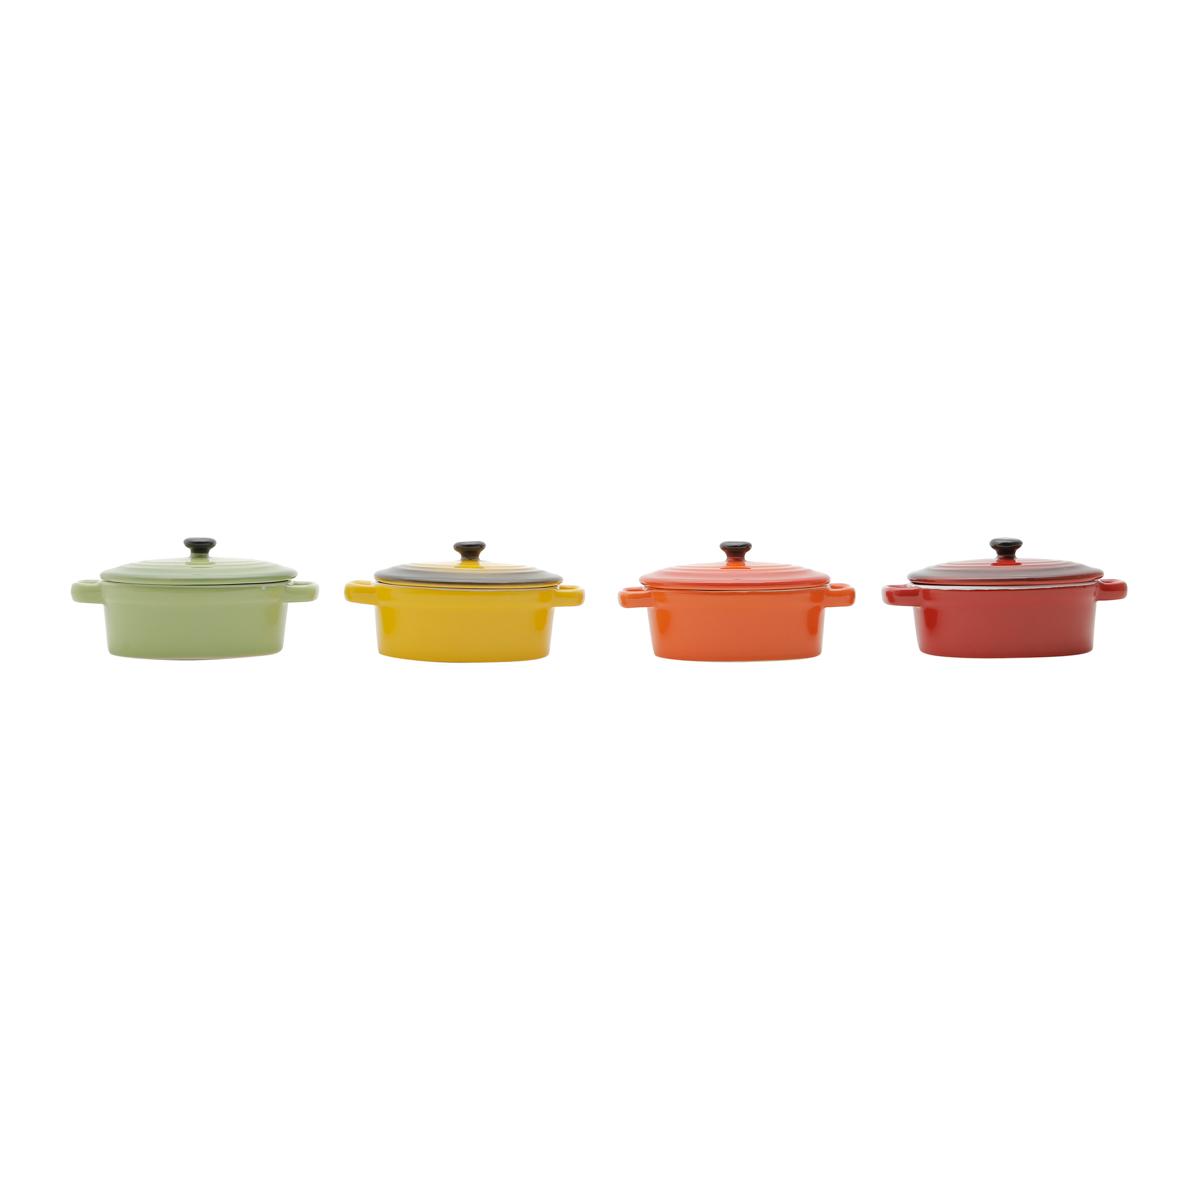 Conjunto 4 mini panelas  com tampa de porcelana coloridas Bon Gourmet - 30397